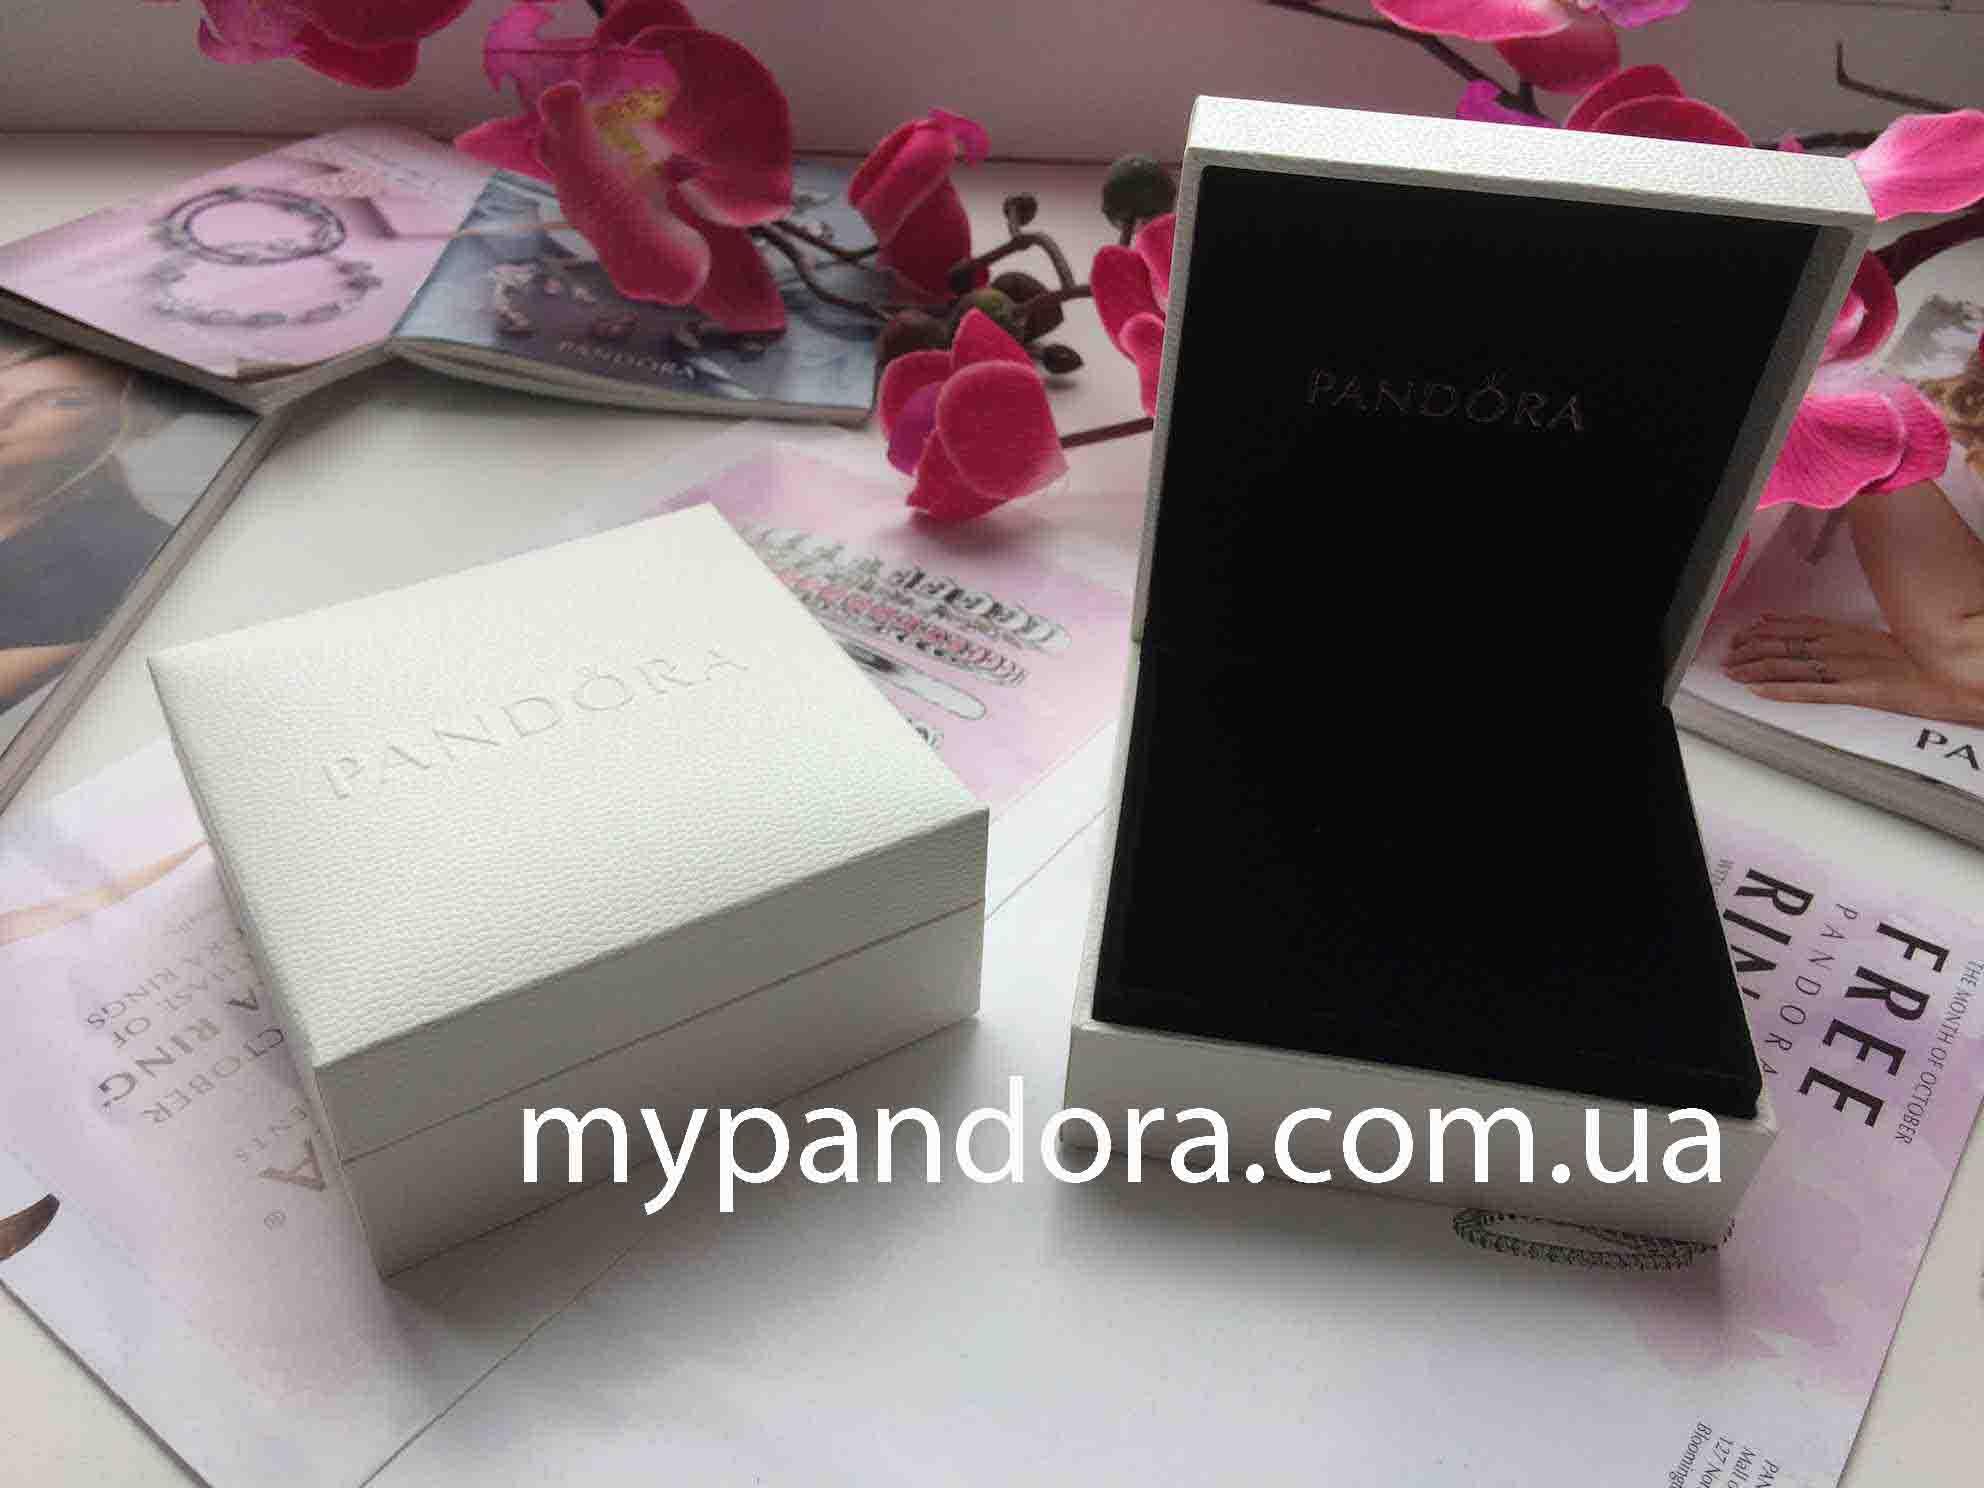 все про упаковку Pandora обзор Brasletycomua